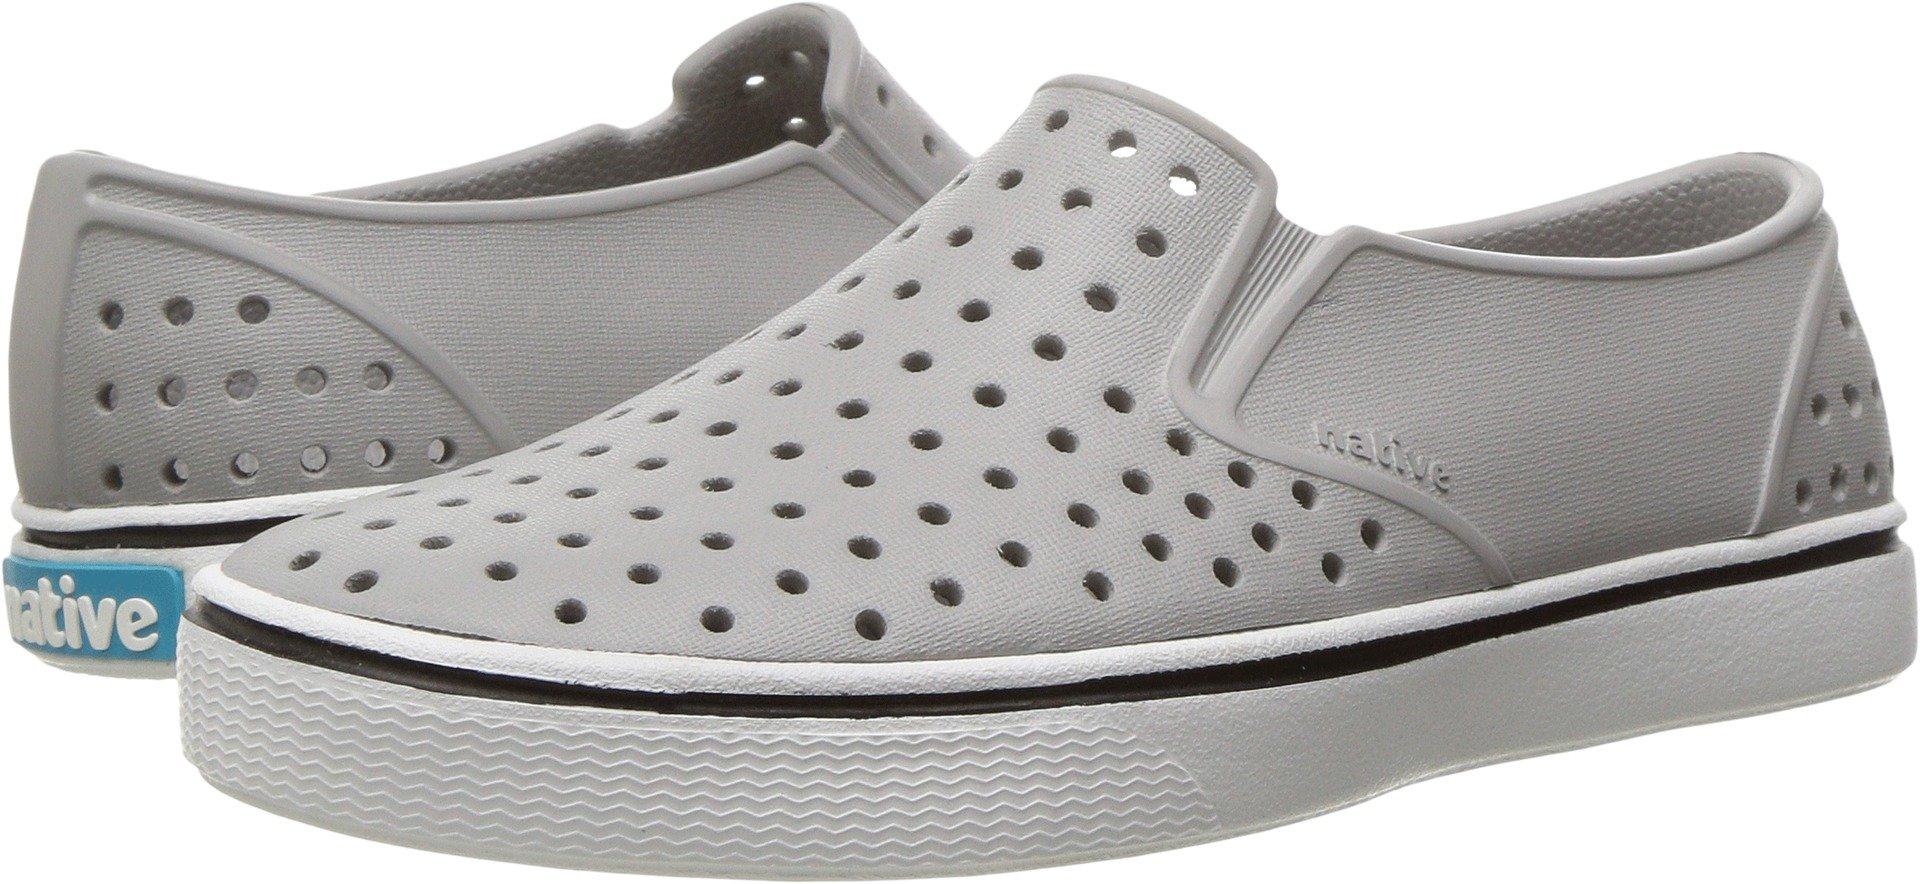 Native Unisex-kids Miles Water Proof Shoes, Pigeon Grey/Shell White, 4 Medium US Big Kid